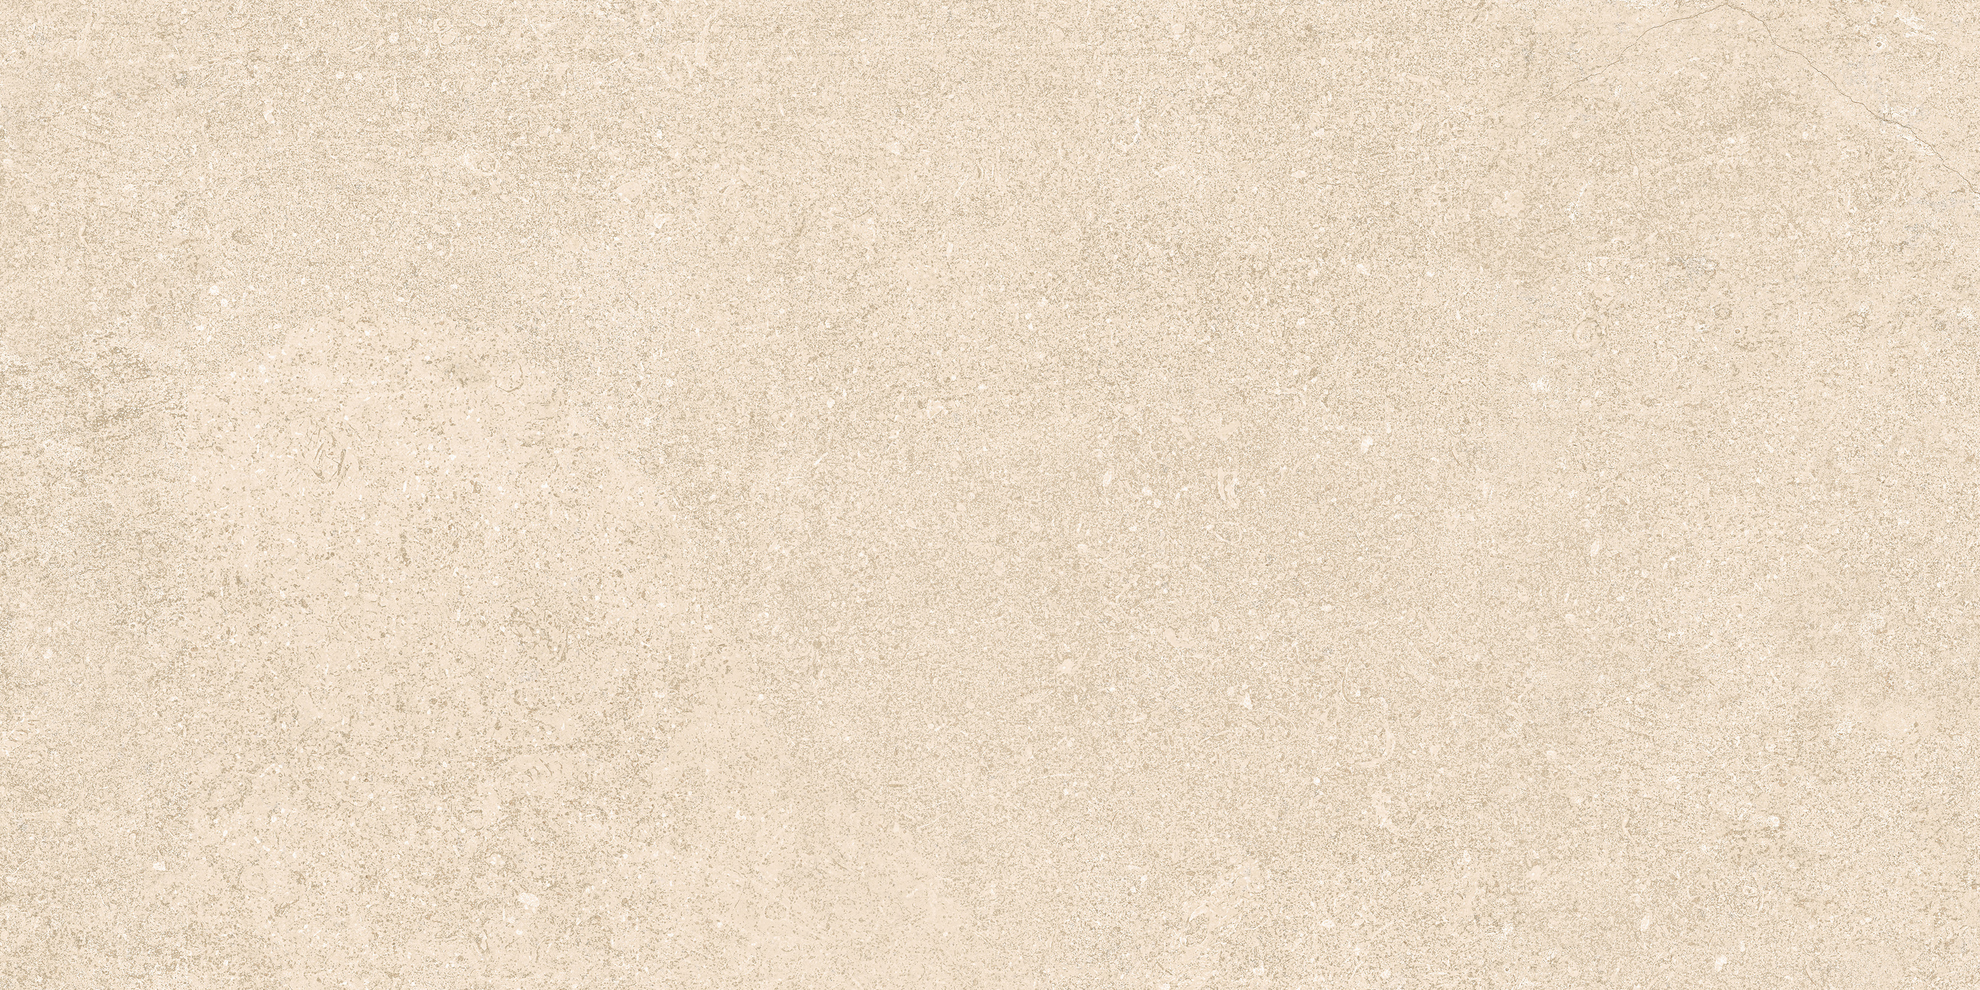 30x60 Newcon Tile Cream Matt